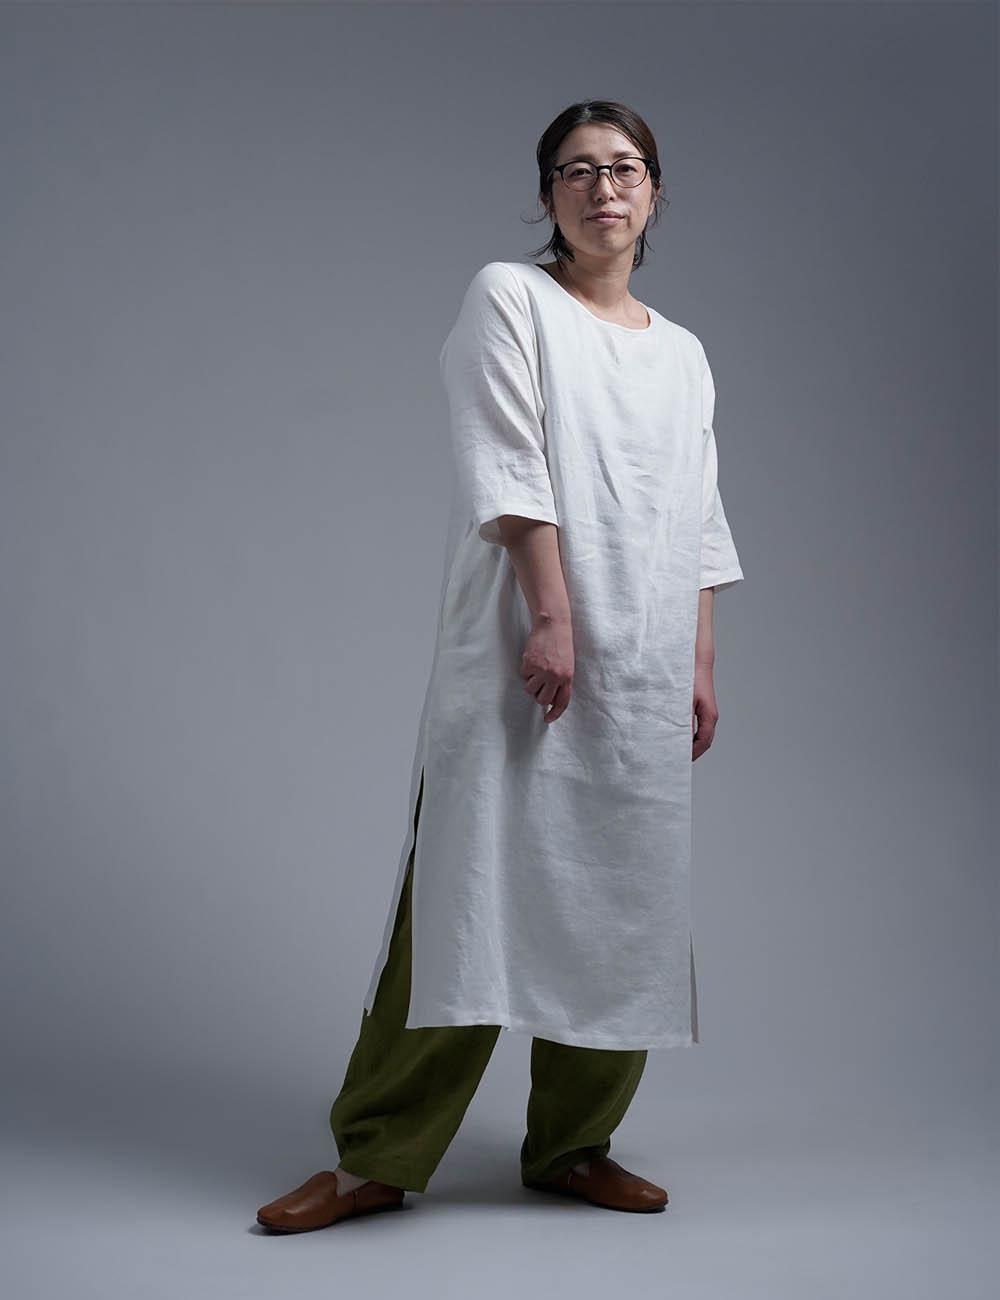 【wafu】Wafu Premium Linen スリットワンピース / ホワイト a032j-wht2